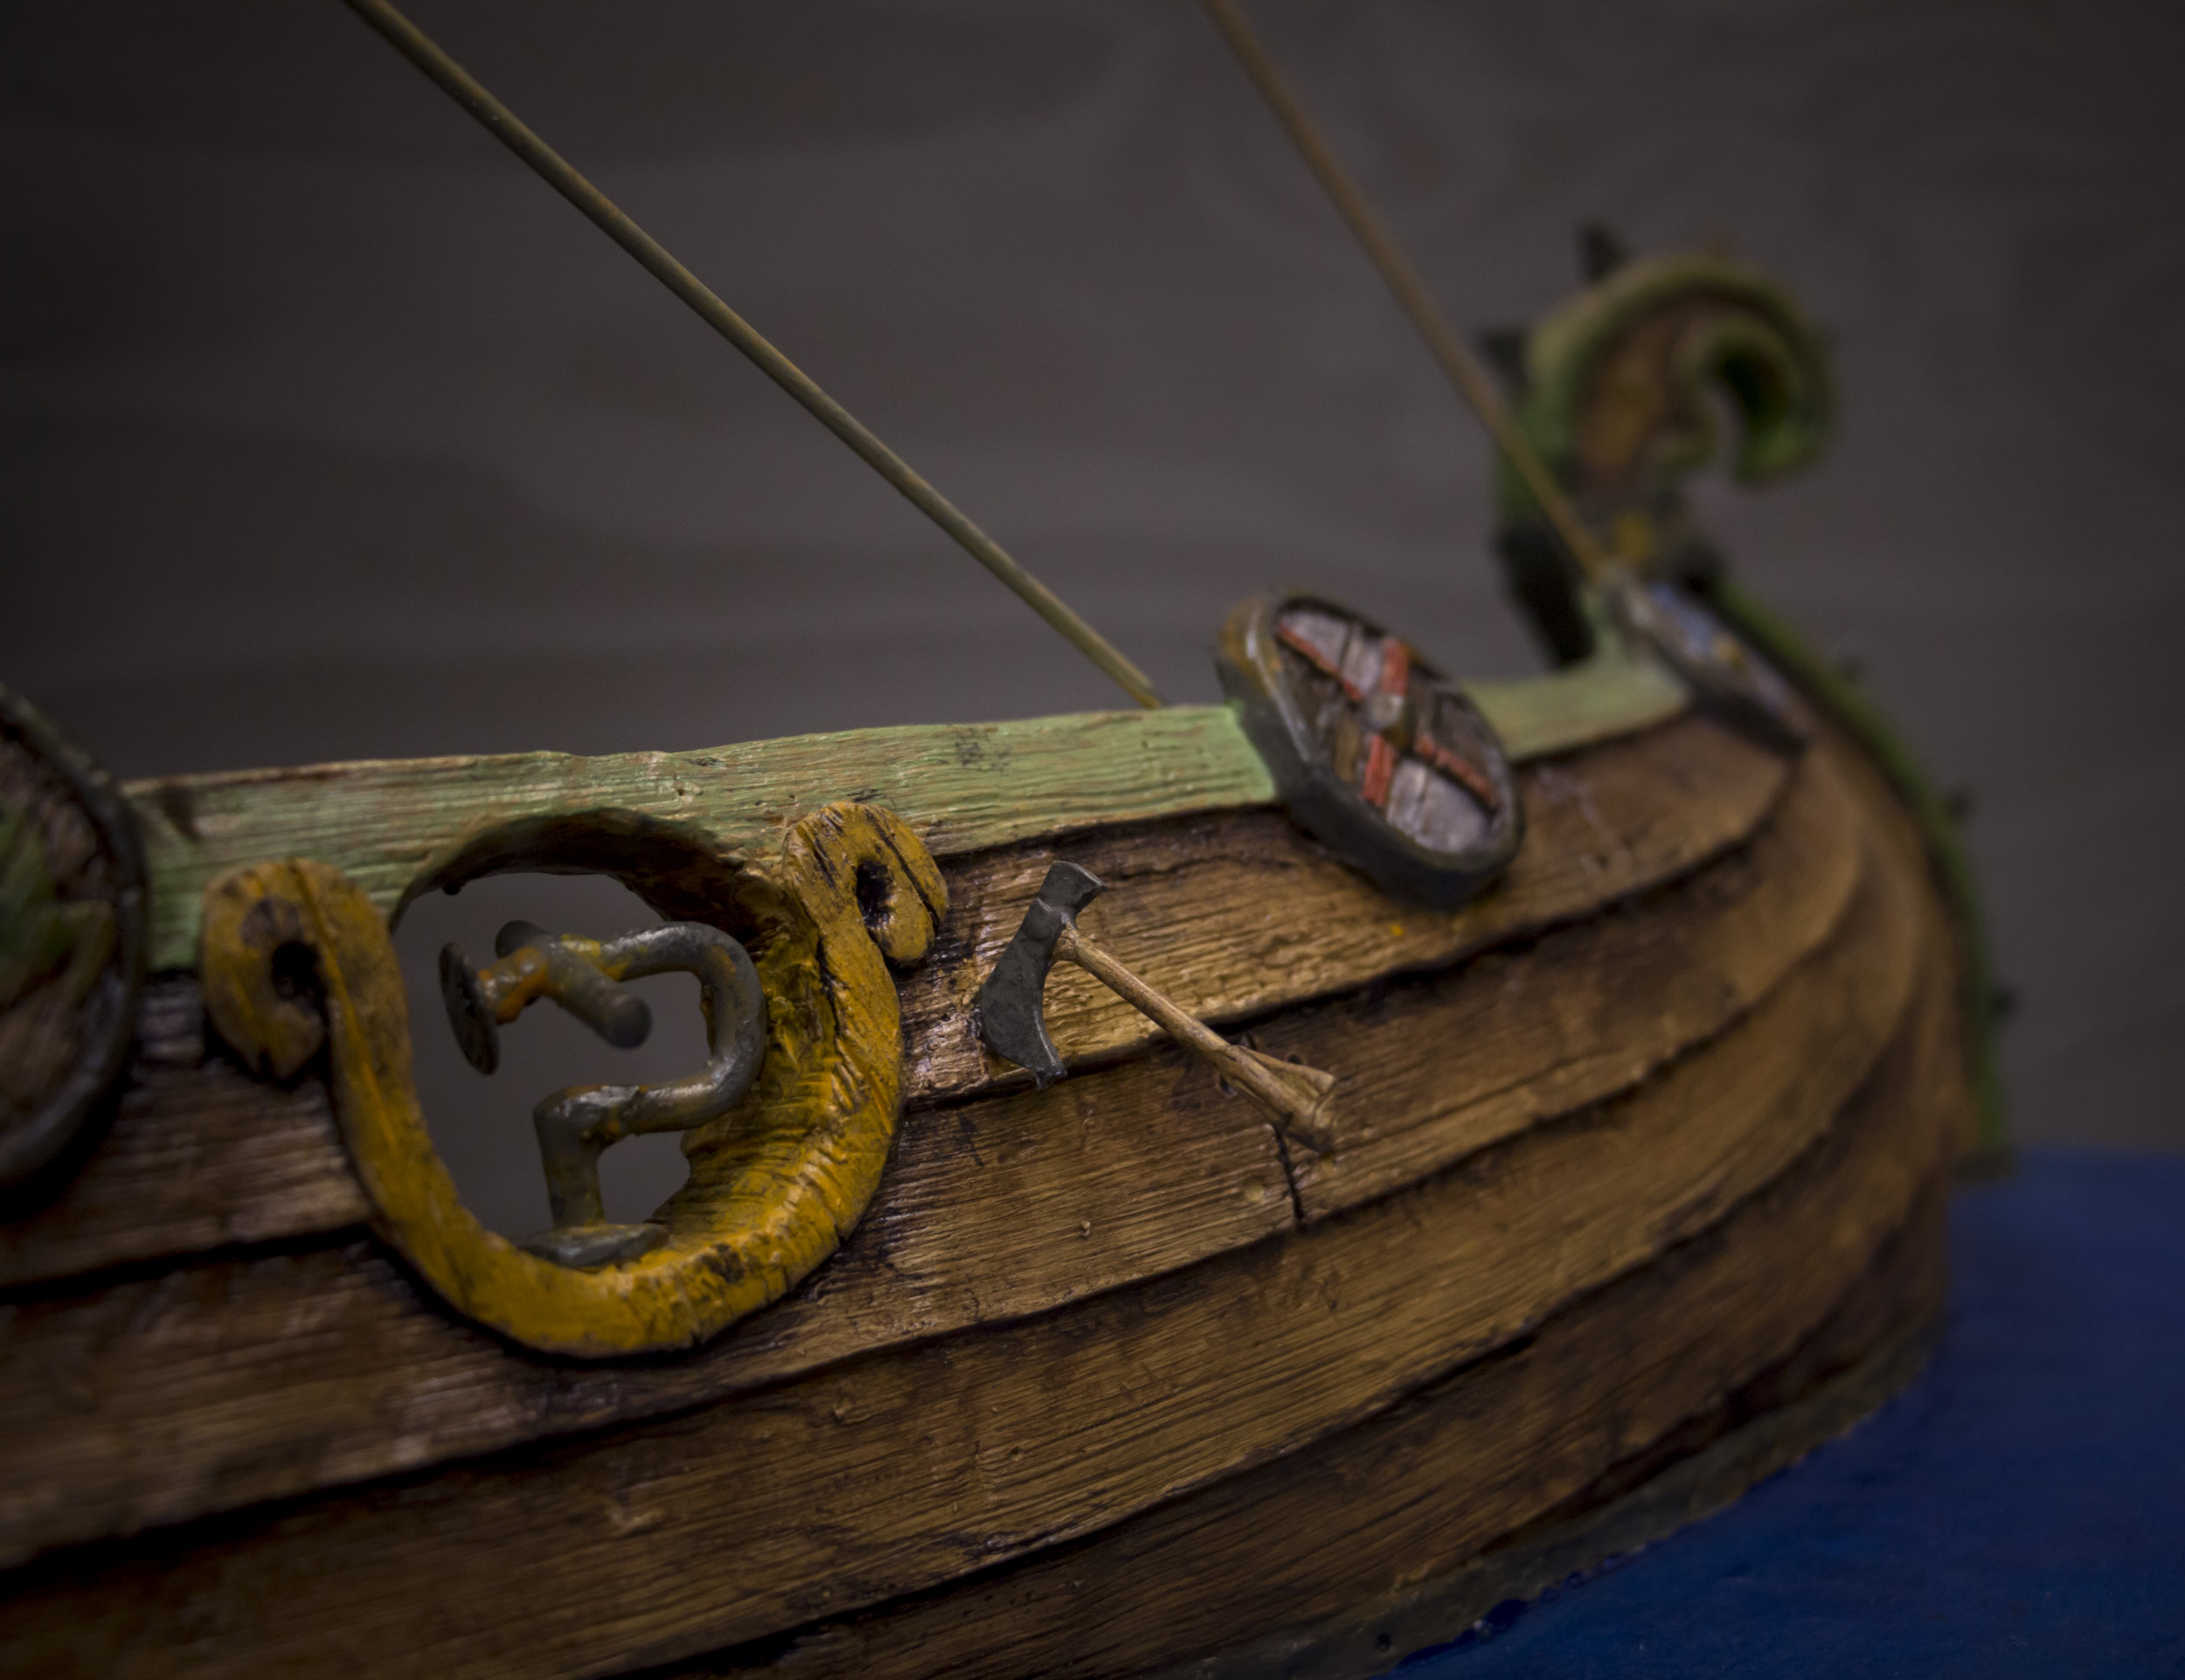 viking-ship-model-7.jpg